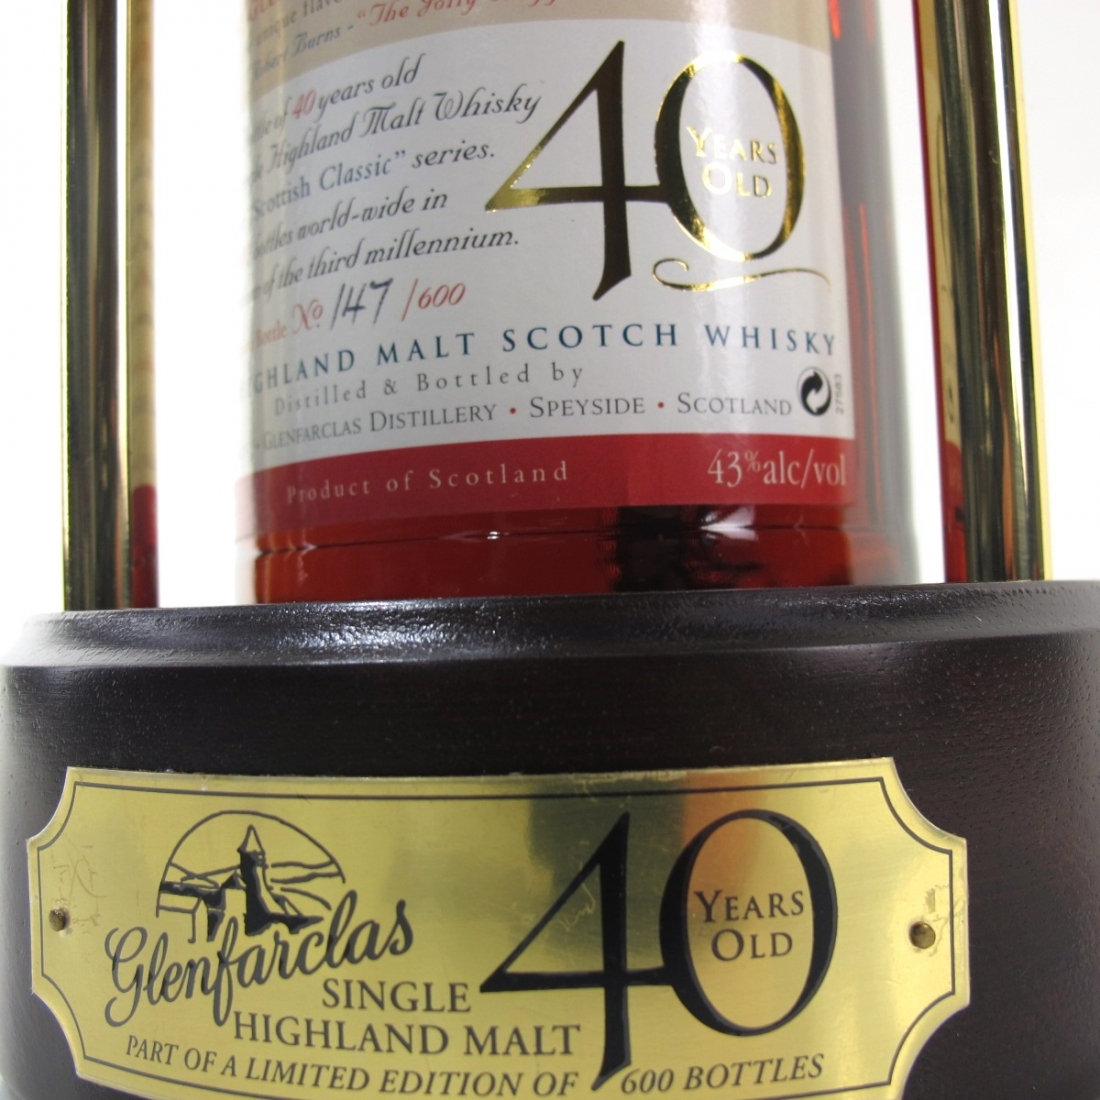 Glenfarclas 40 Year Old Scottish Classic